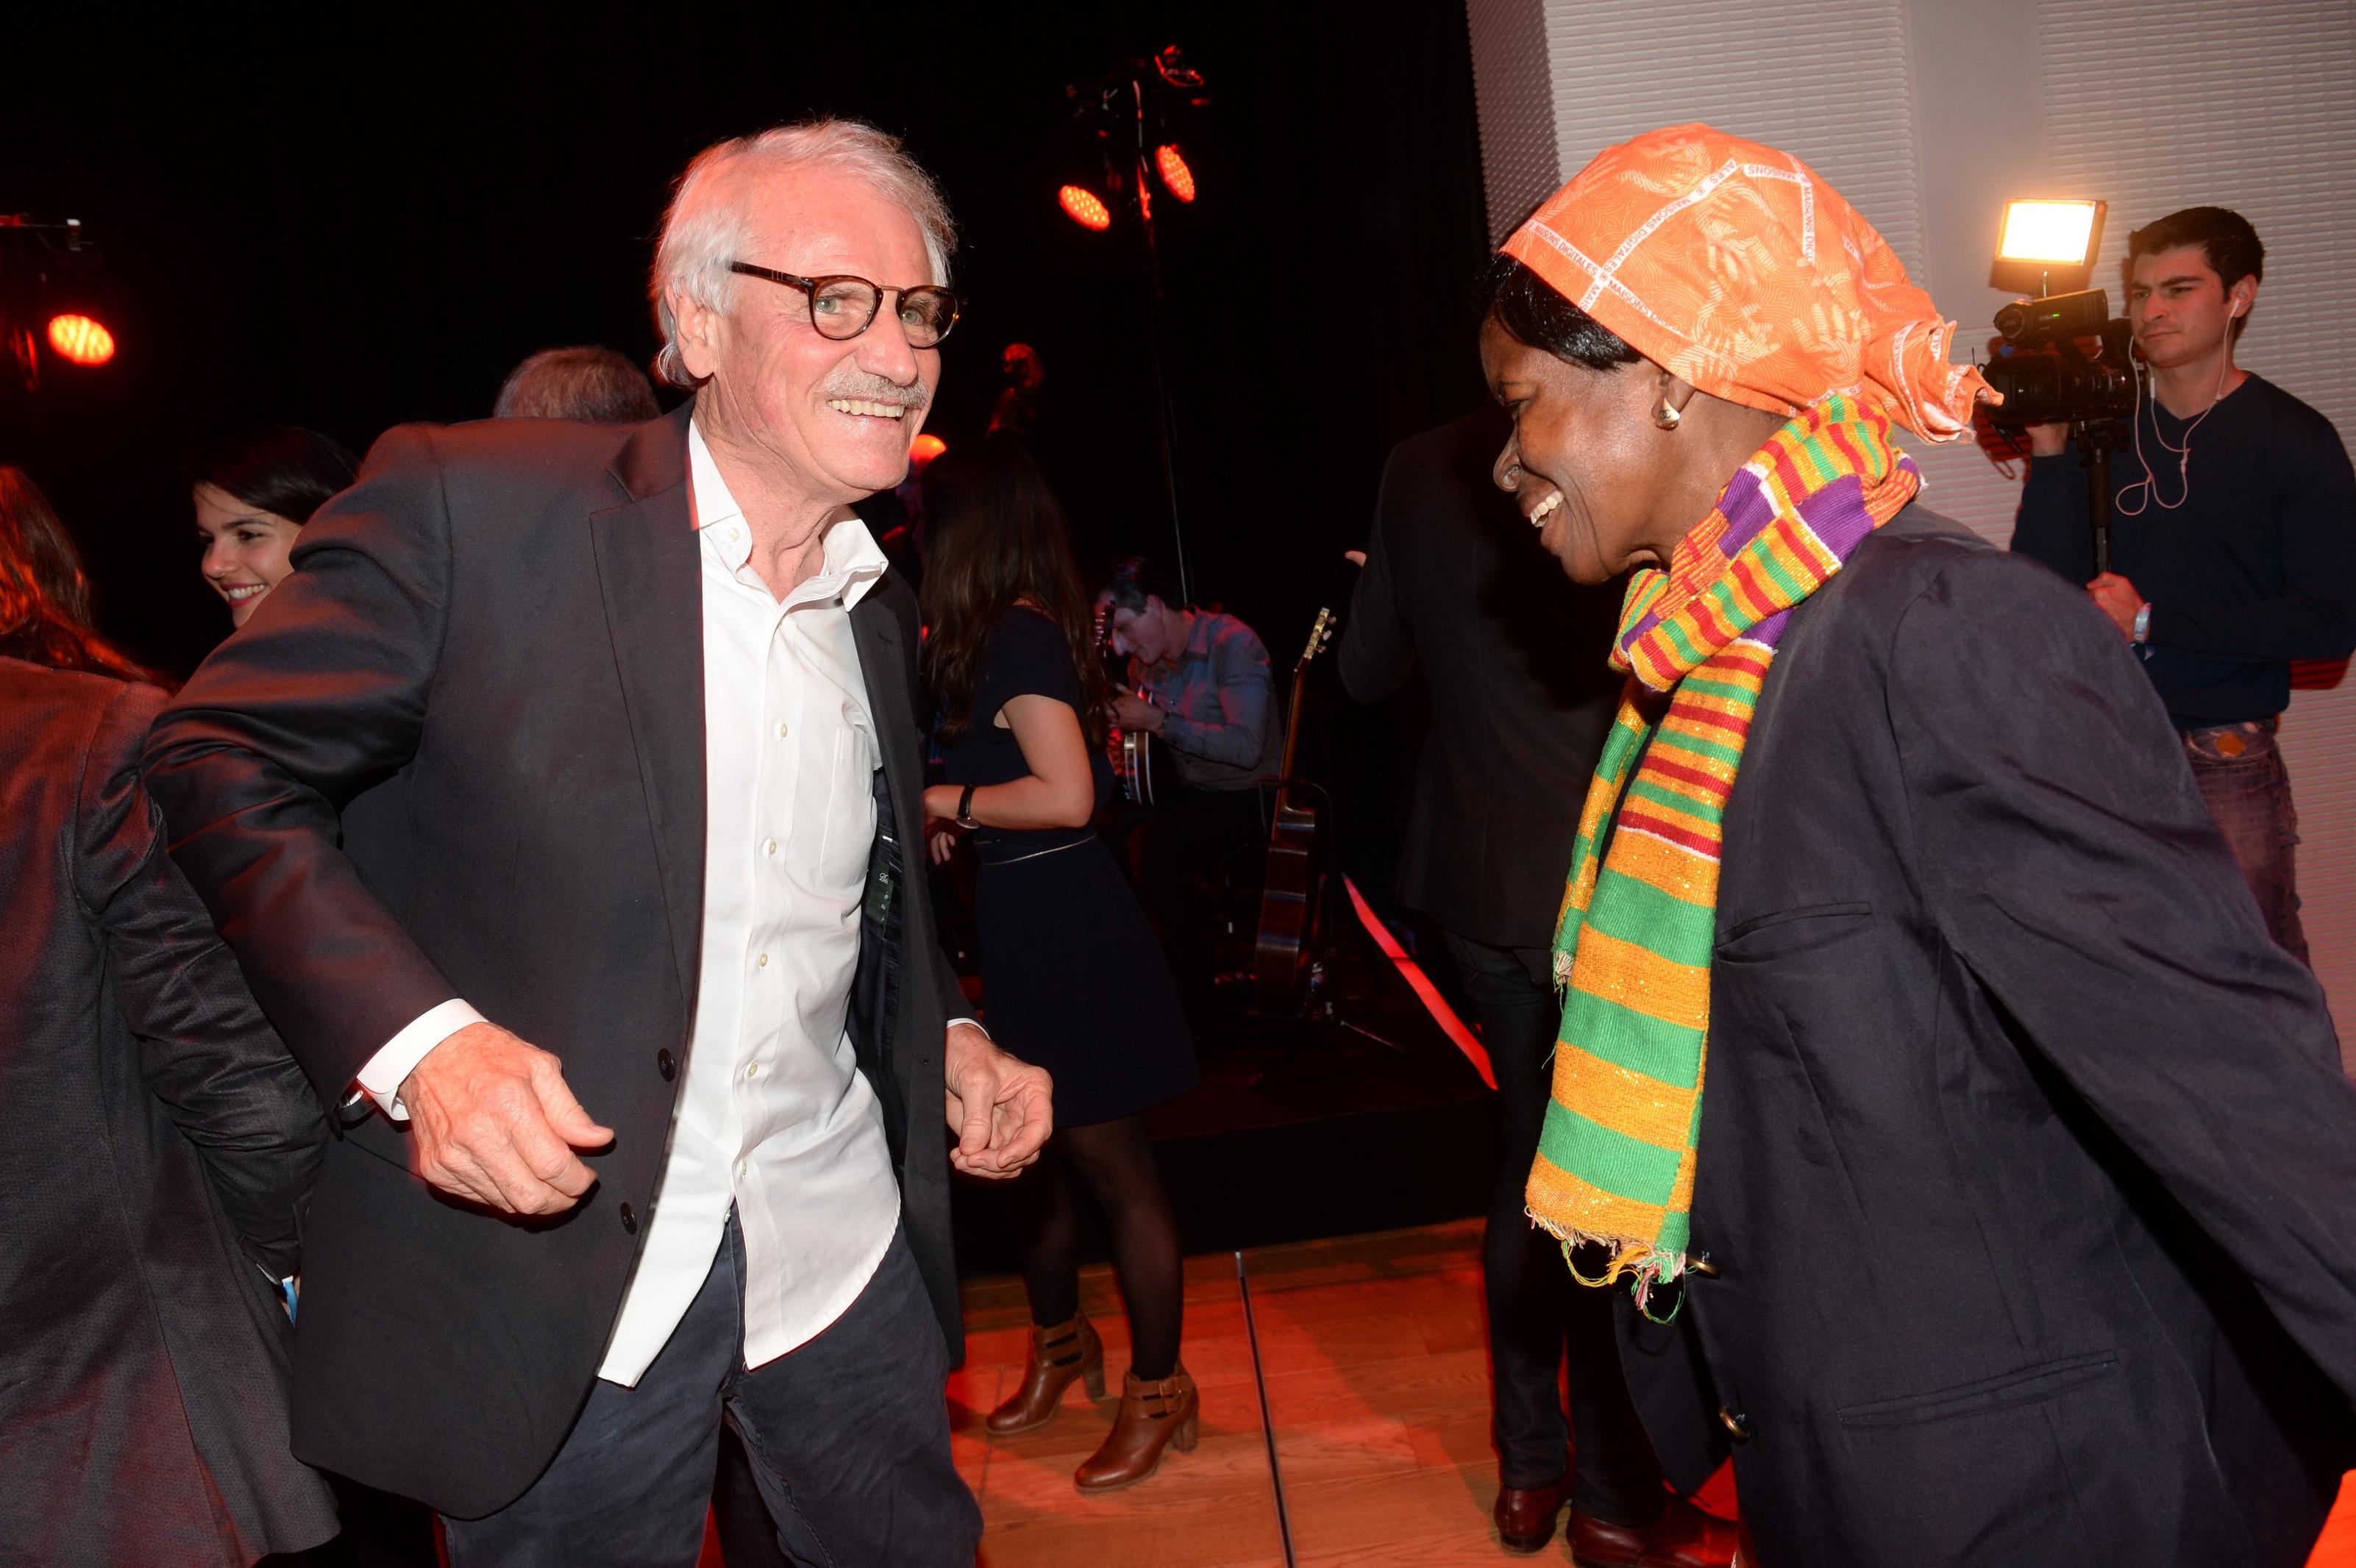 yann-arthus-bertrand-danse-avec-la-laureate-philomene